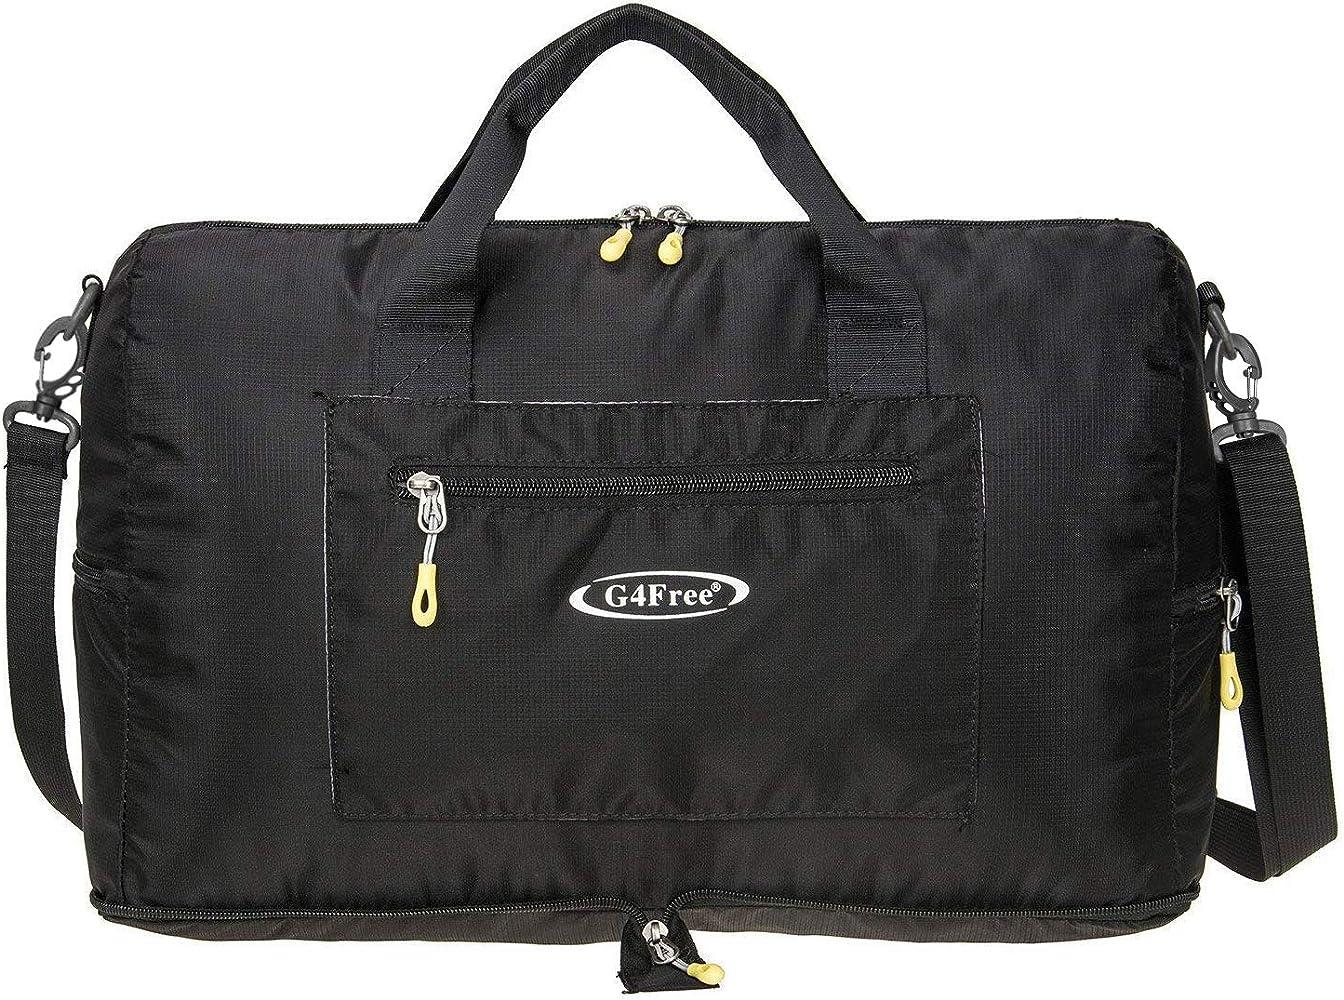 Travel Luggage Duffle Bag Lightweight Portable Handbag Football Large Capacity Waterproof Foldable Storage Tote